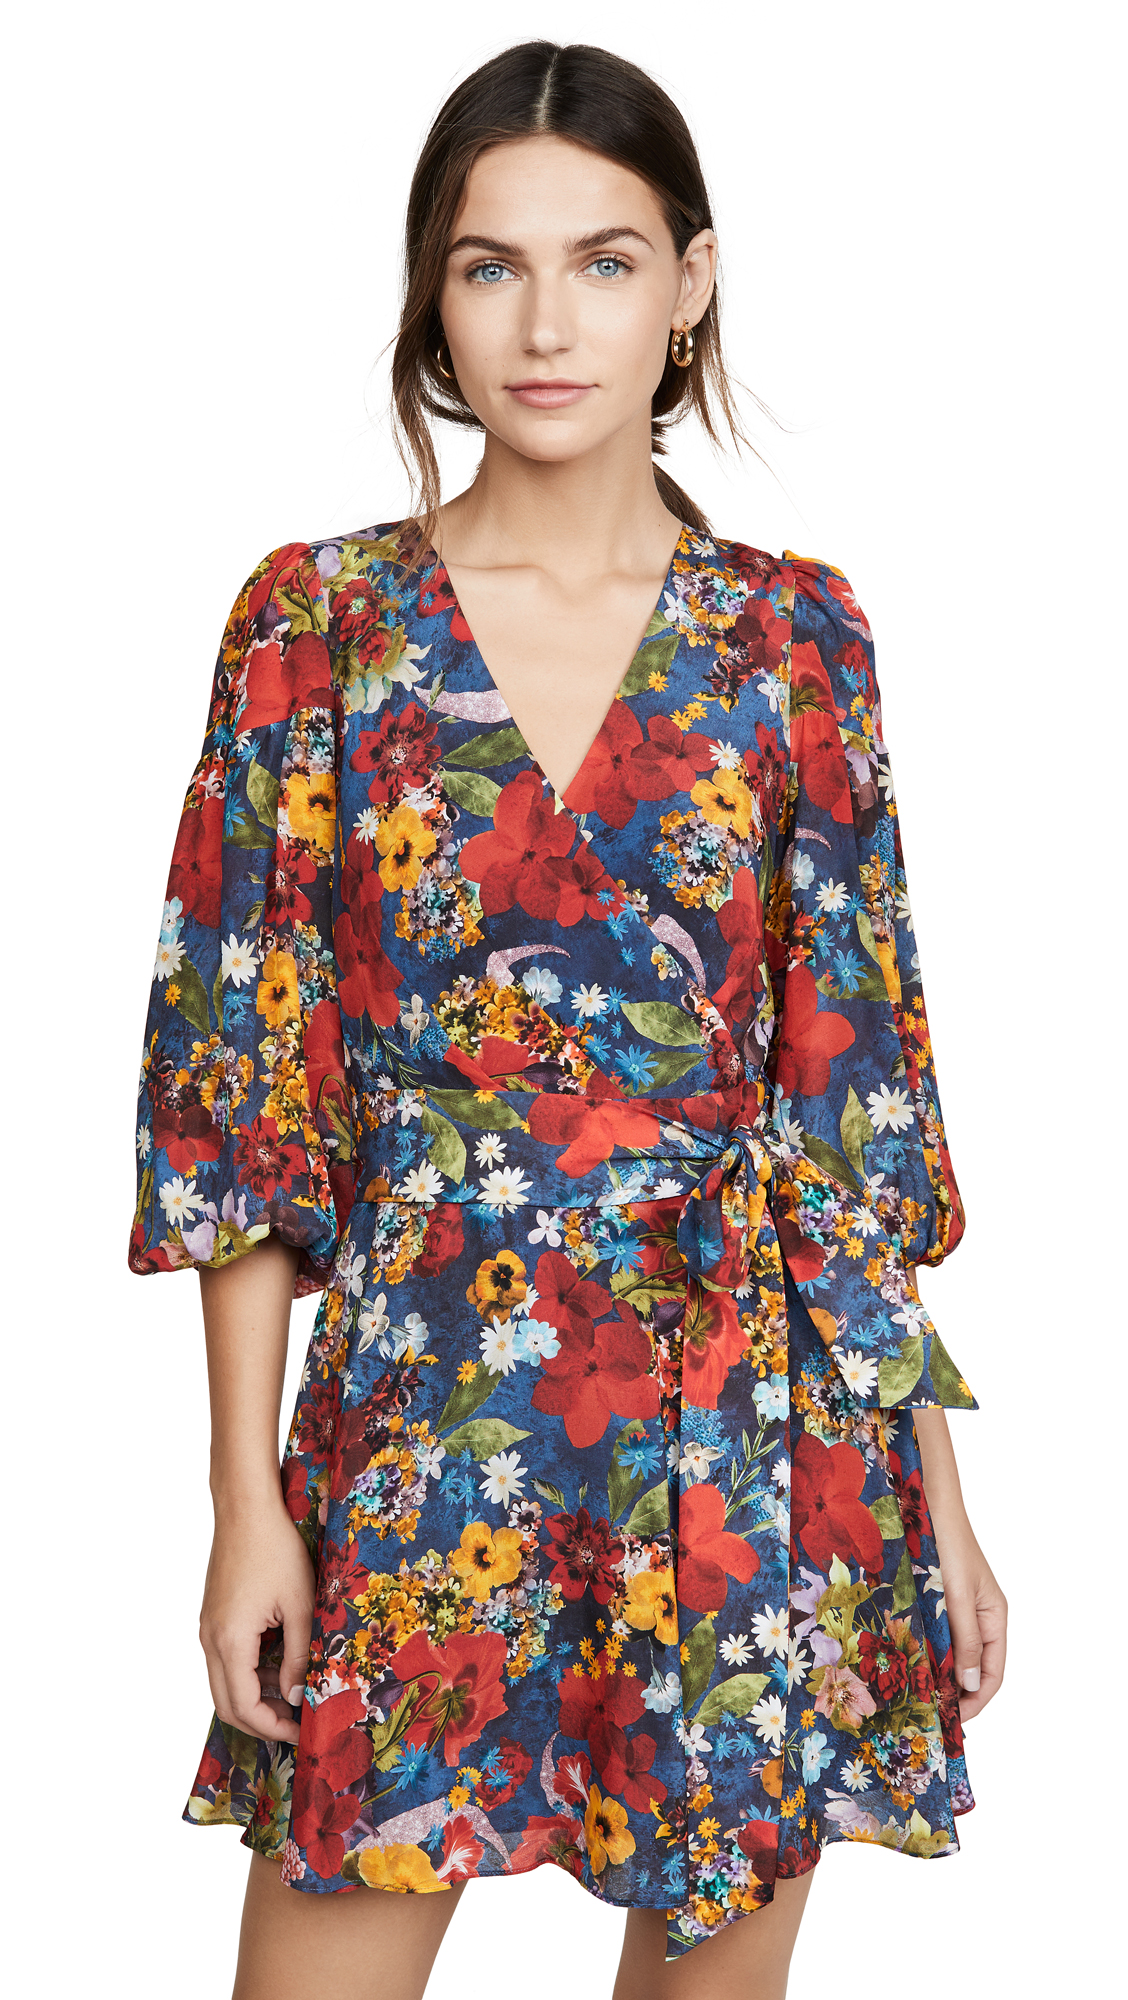 alice + olivia Kerri Bishop Sleeve Wrap Dress - Colorful Blossom Riviera